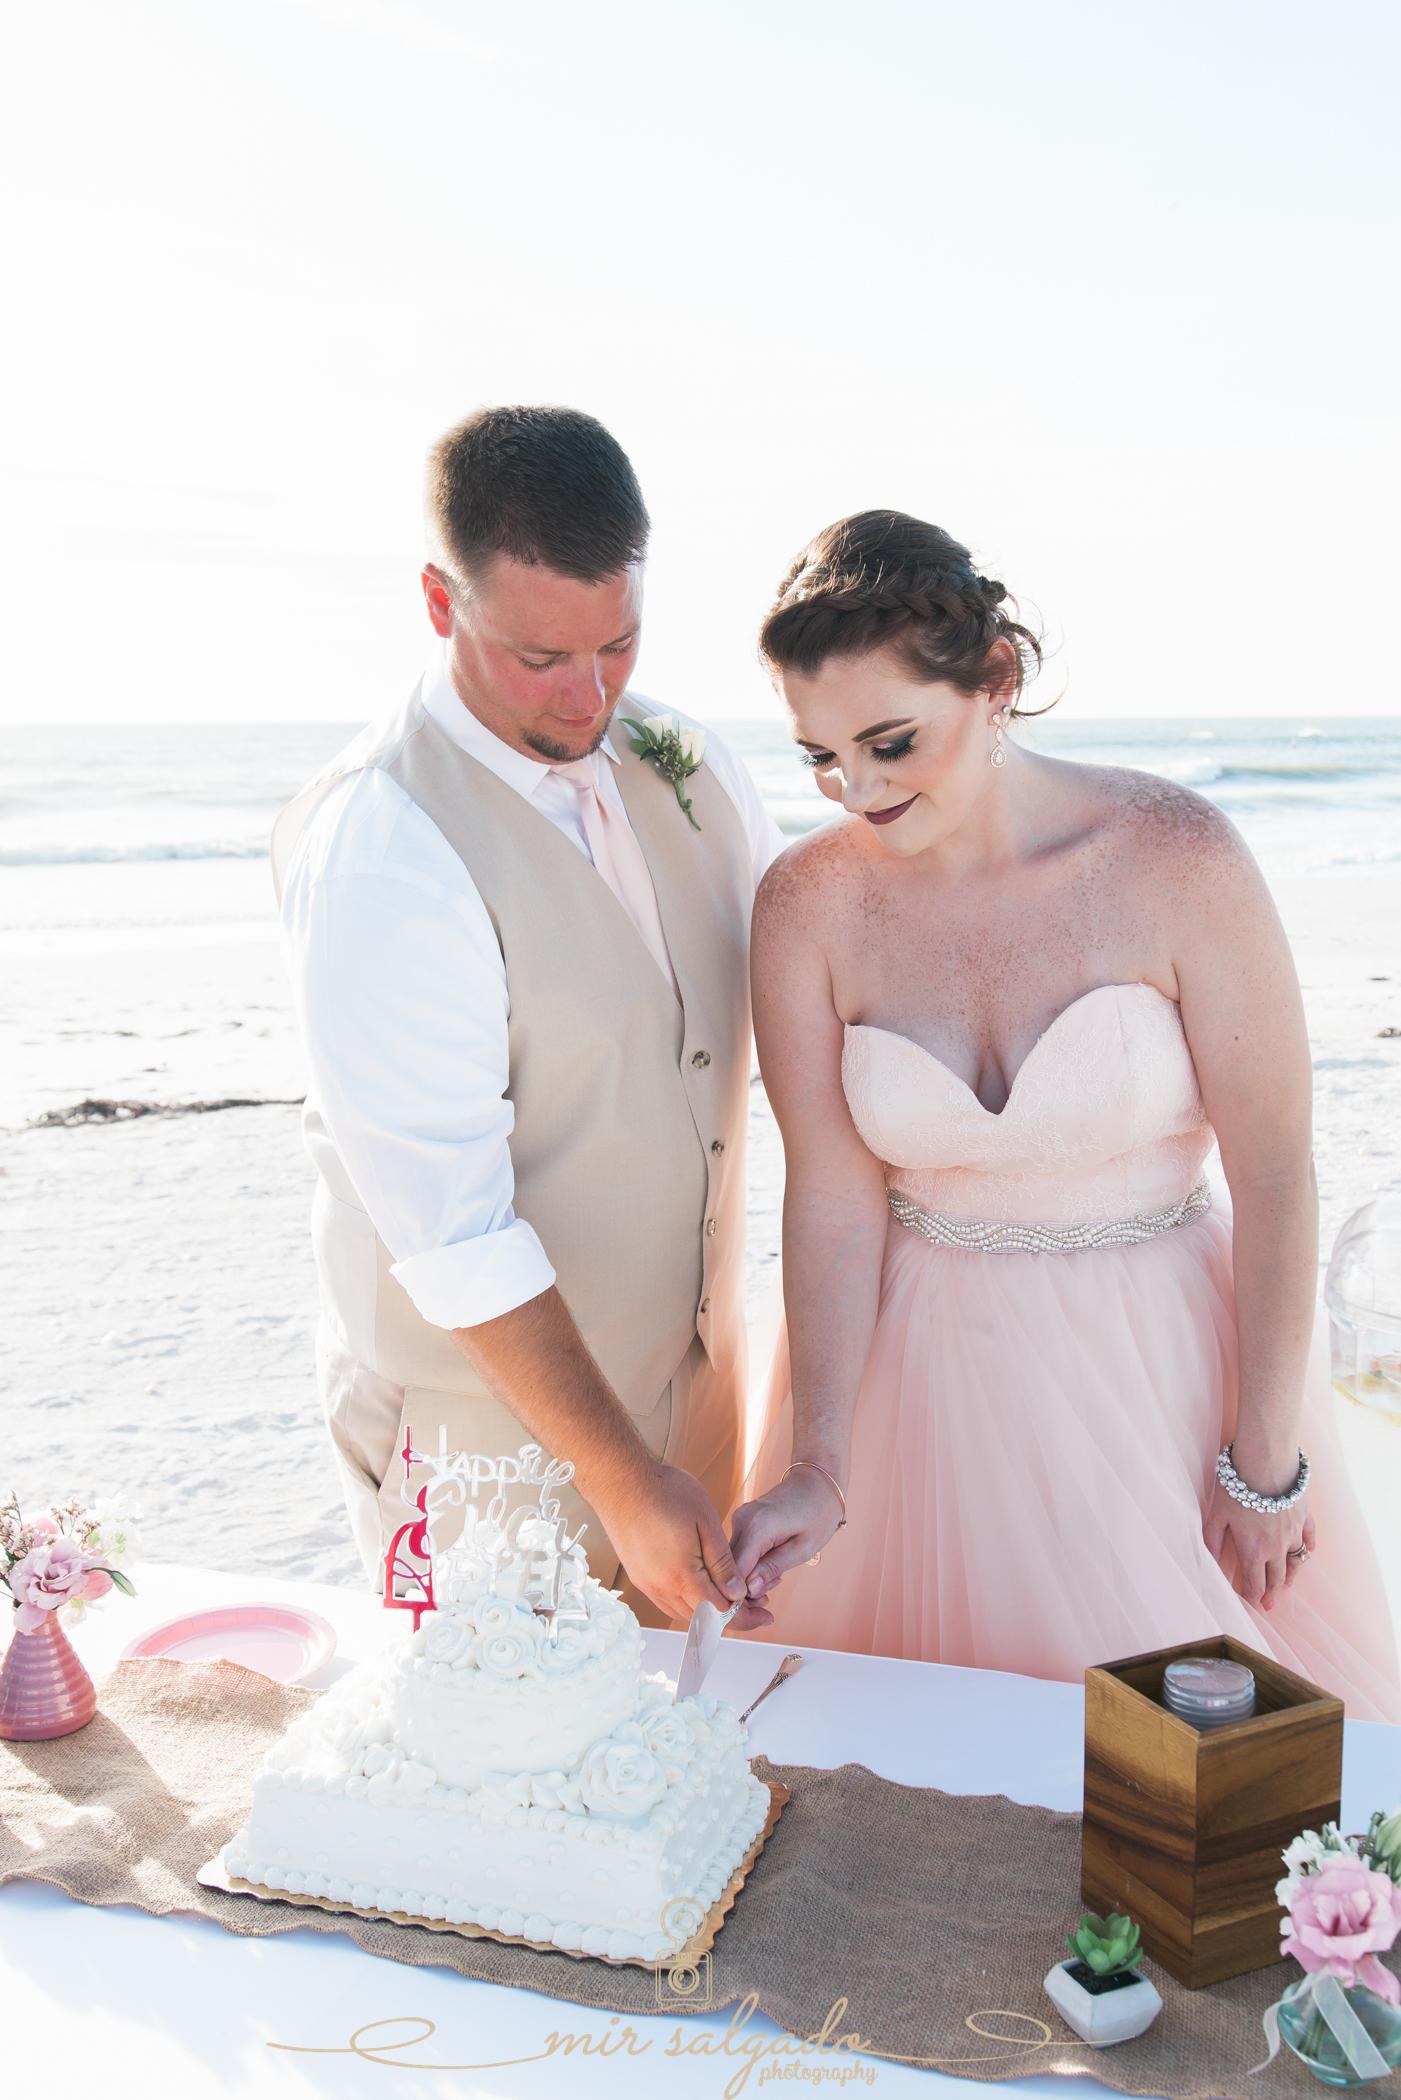 Wedding-cake-photo, beach-wedding-photographer